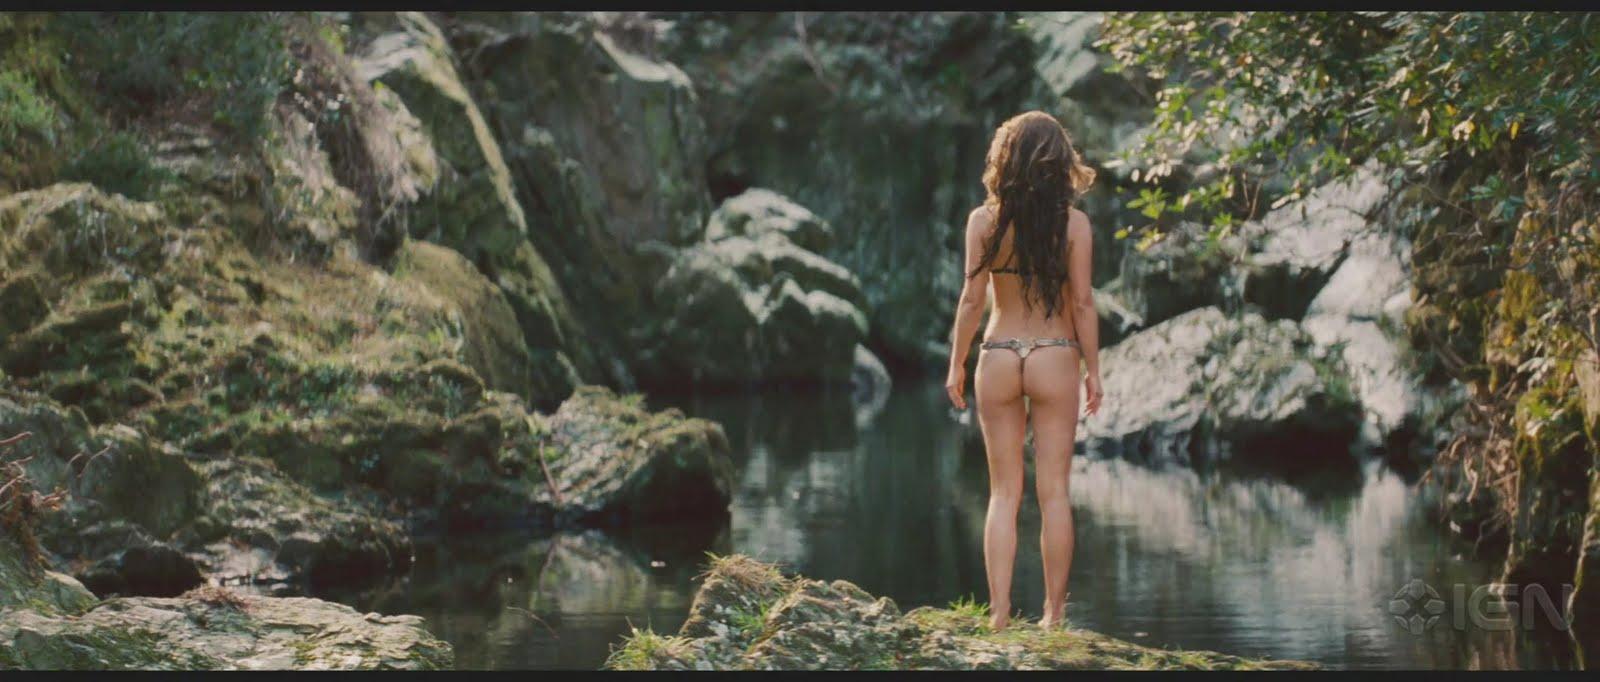 Natalie Portman Your Highness Thong